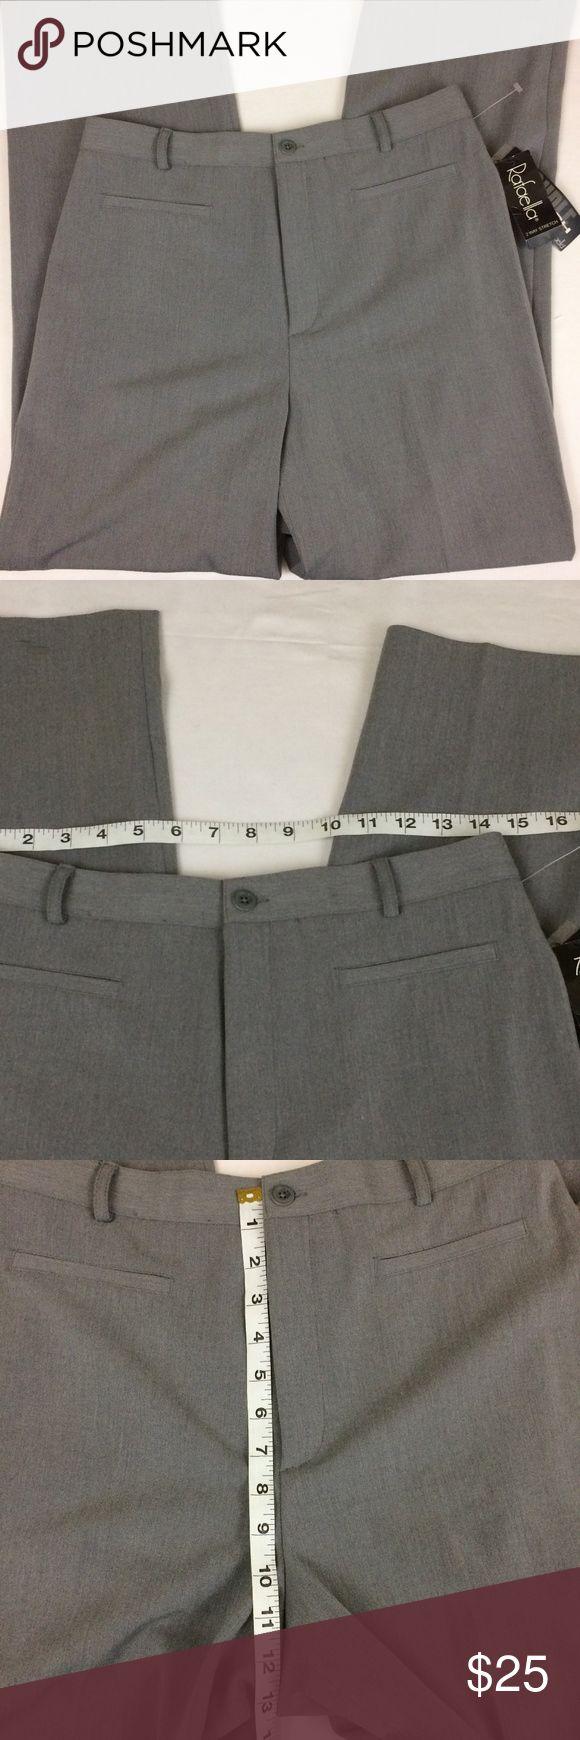 Womens Gray Stretch Size 10 Dress Pants Womens Gray Stretch Size 10 Dress Pants Rafaella Pants